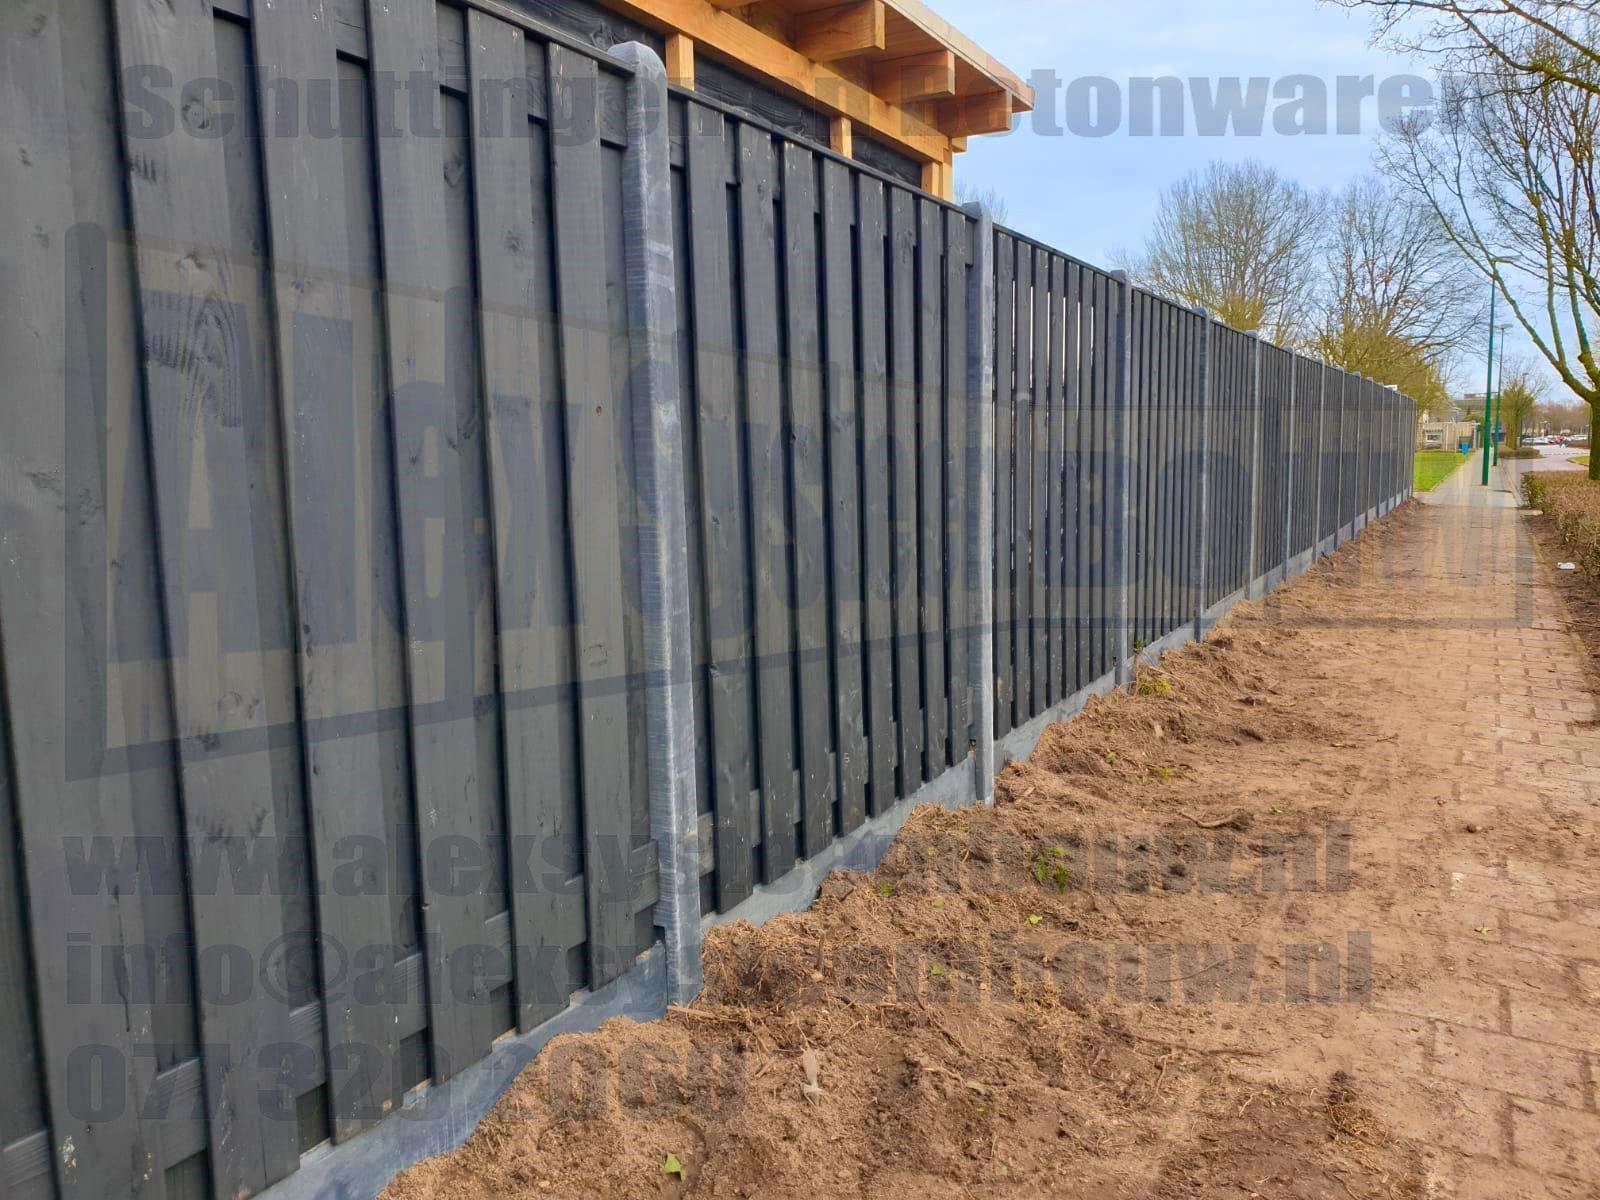 zwart gecoat hout schutting met kegel kop hout beton